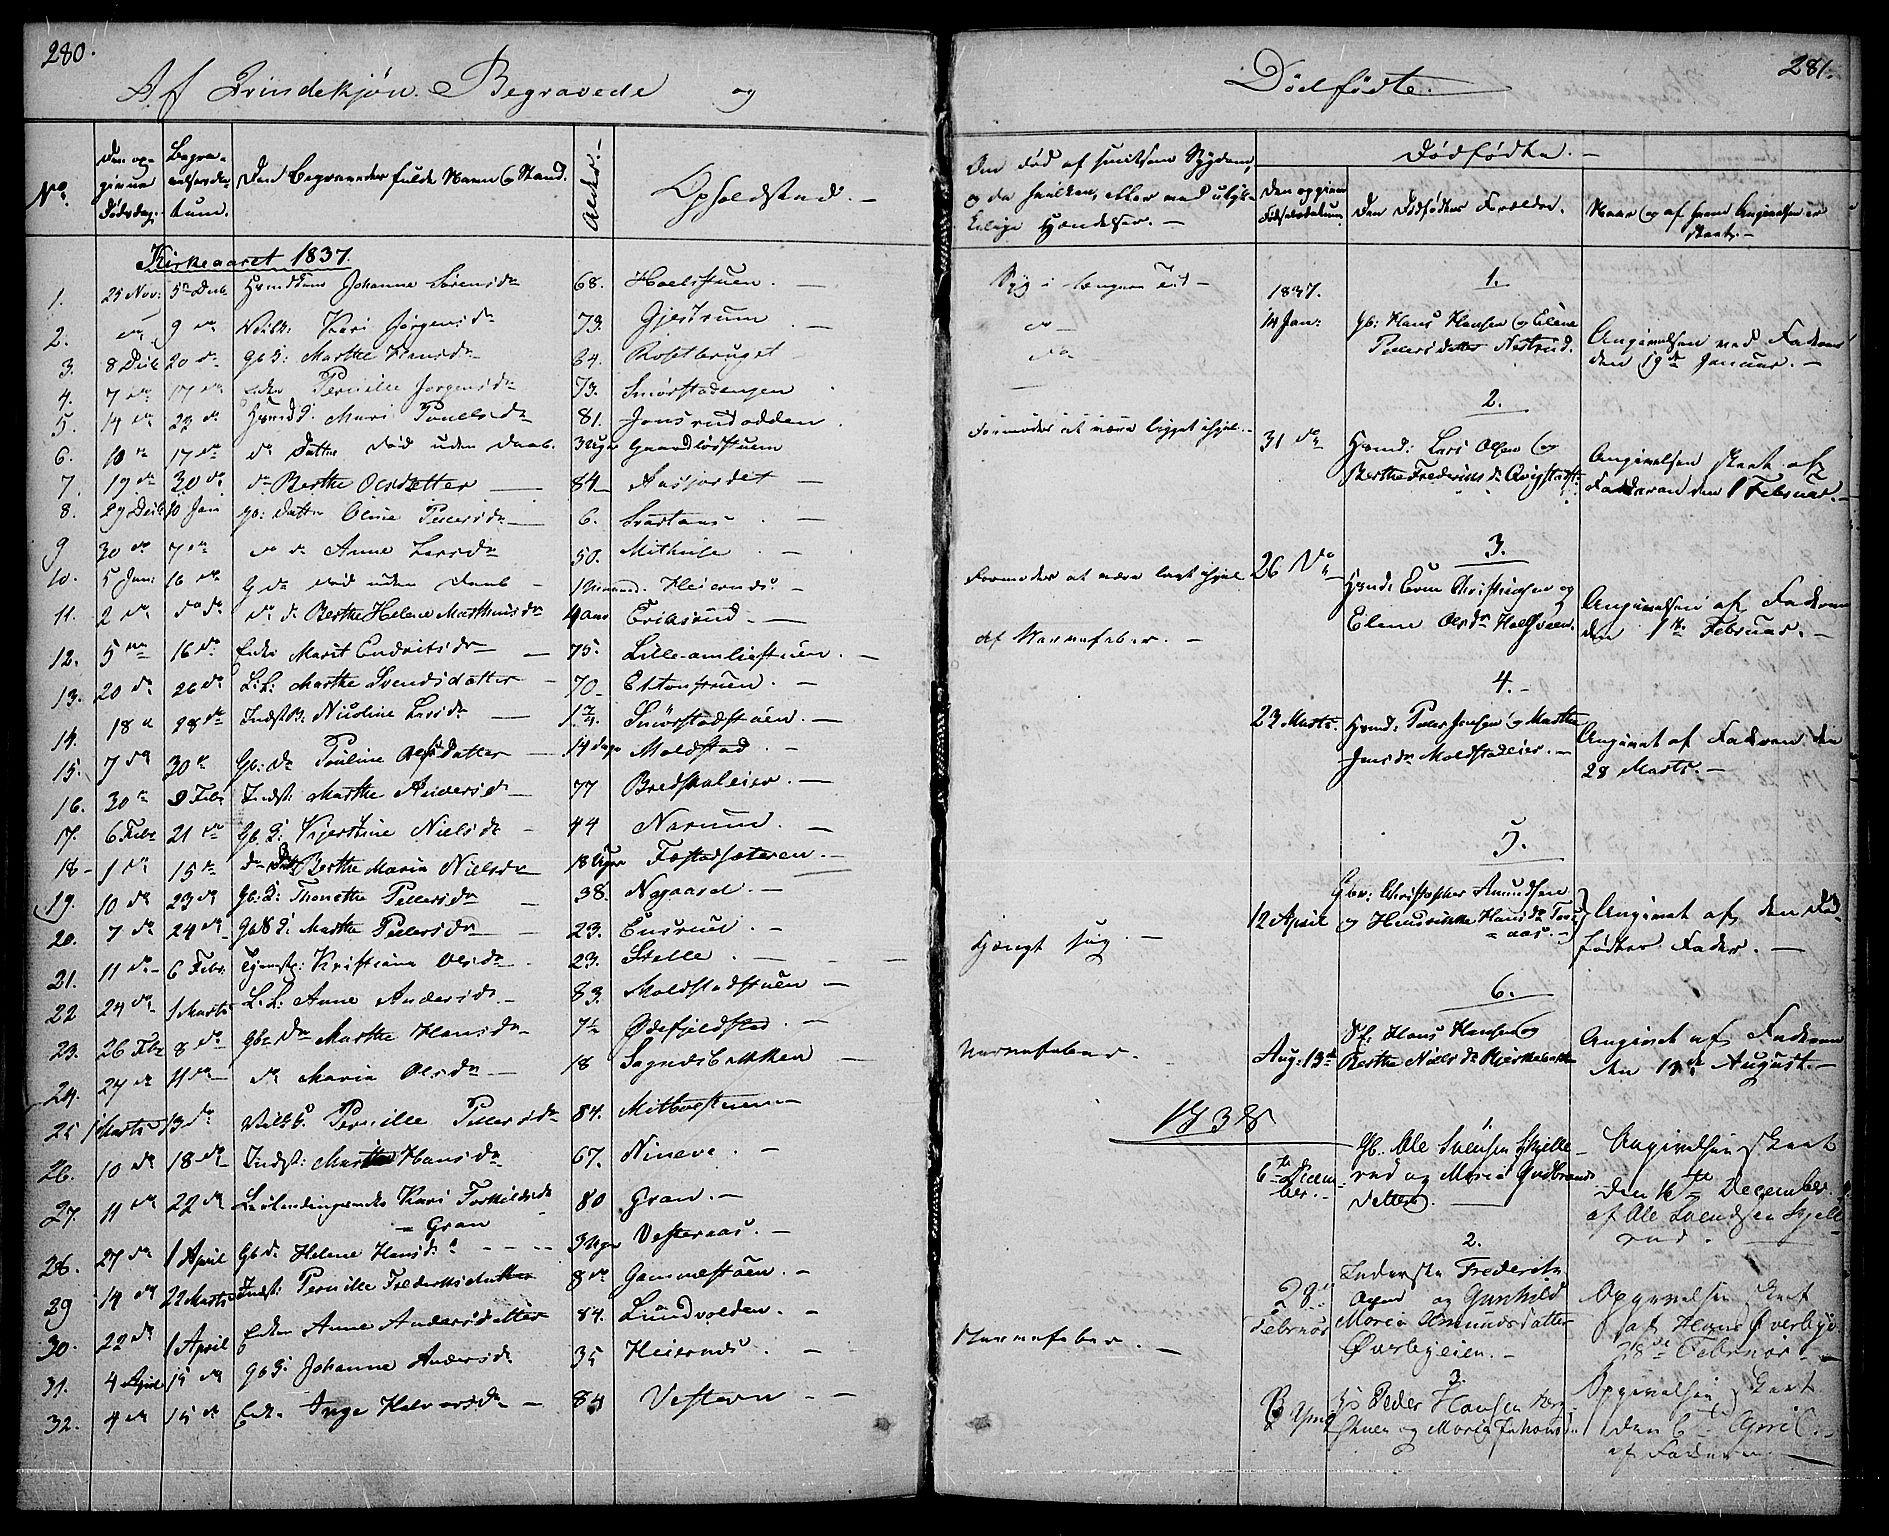 SAH, Vestre Toten prestekontor, H/Ha/Haa/L0003: Ministerialbok nr. 3, 1836-1843, s. 280-281